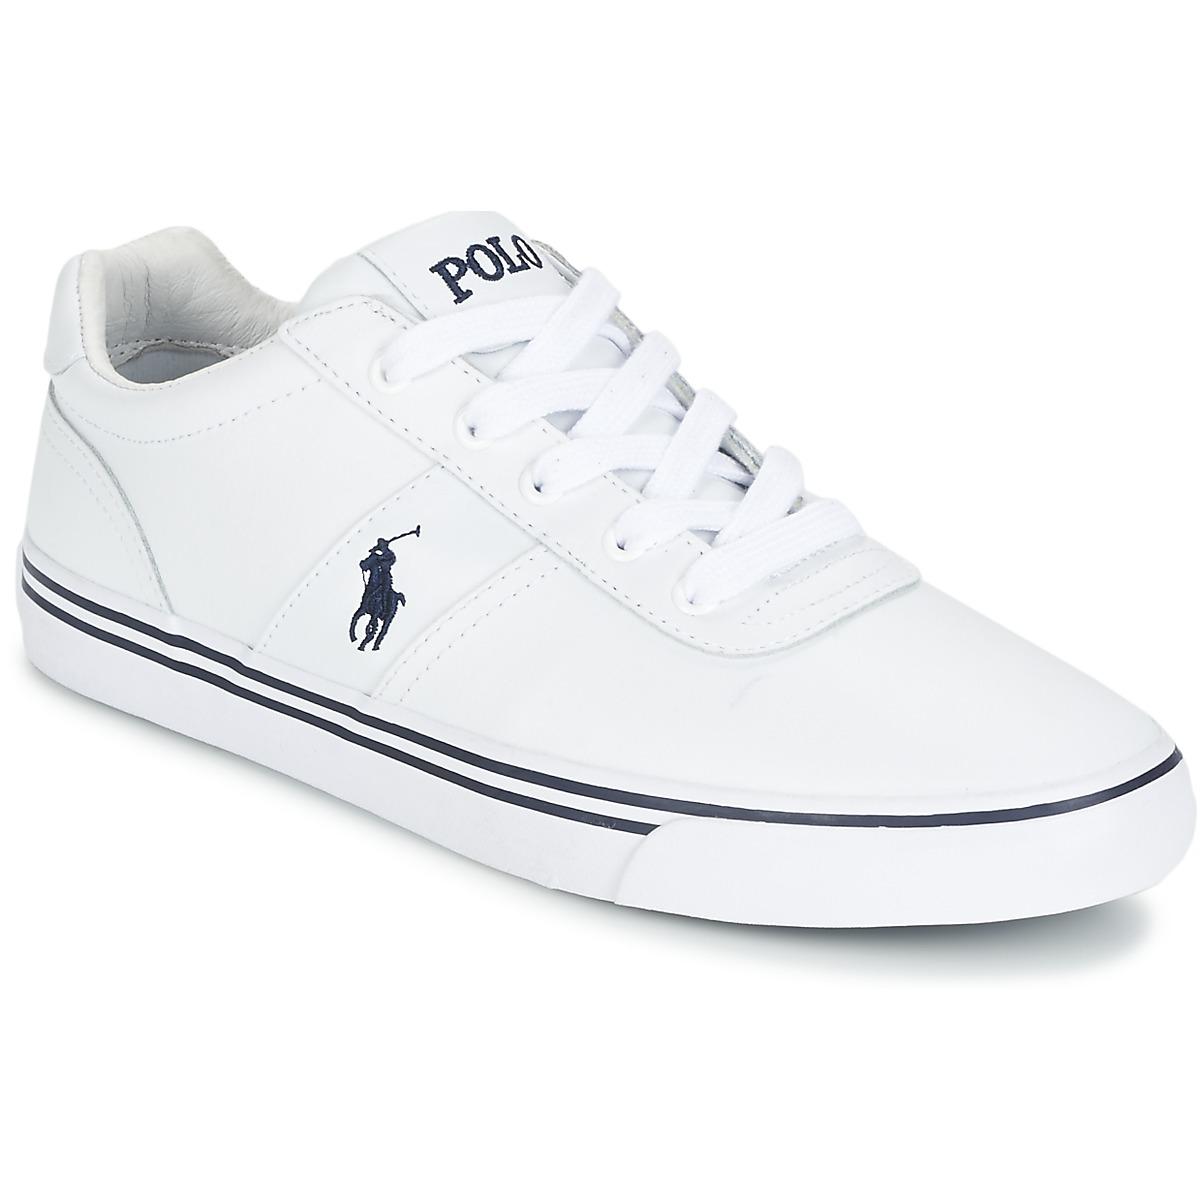 Polo Ralph Lauren HANFORD Blanc pour homme